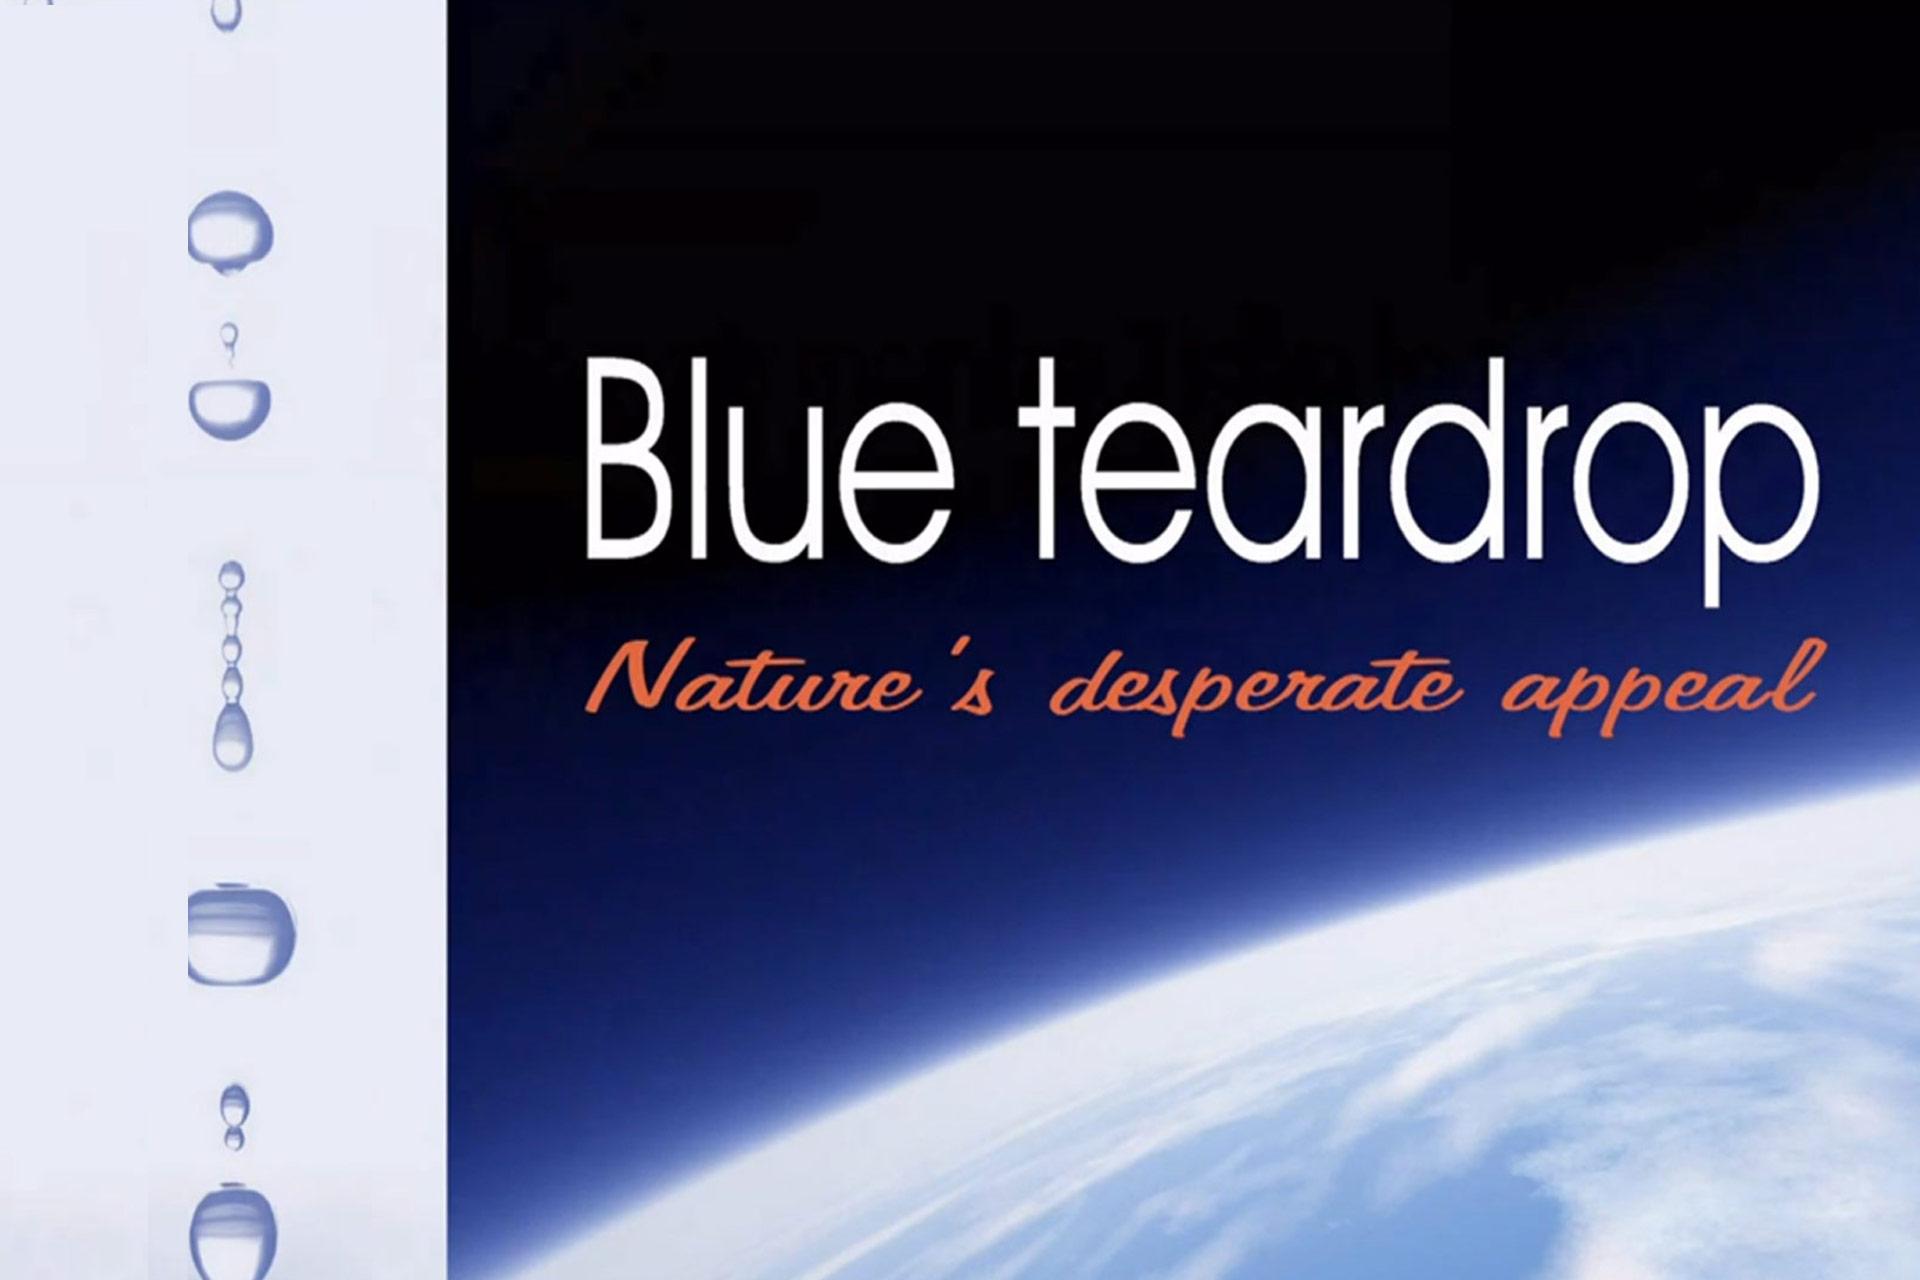 Blue teardrop - Nature's appeal